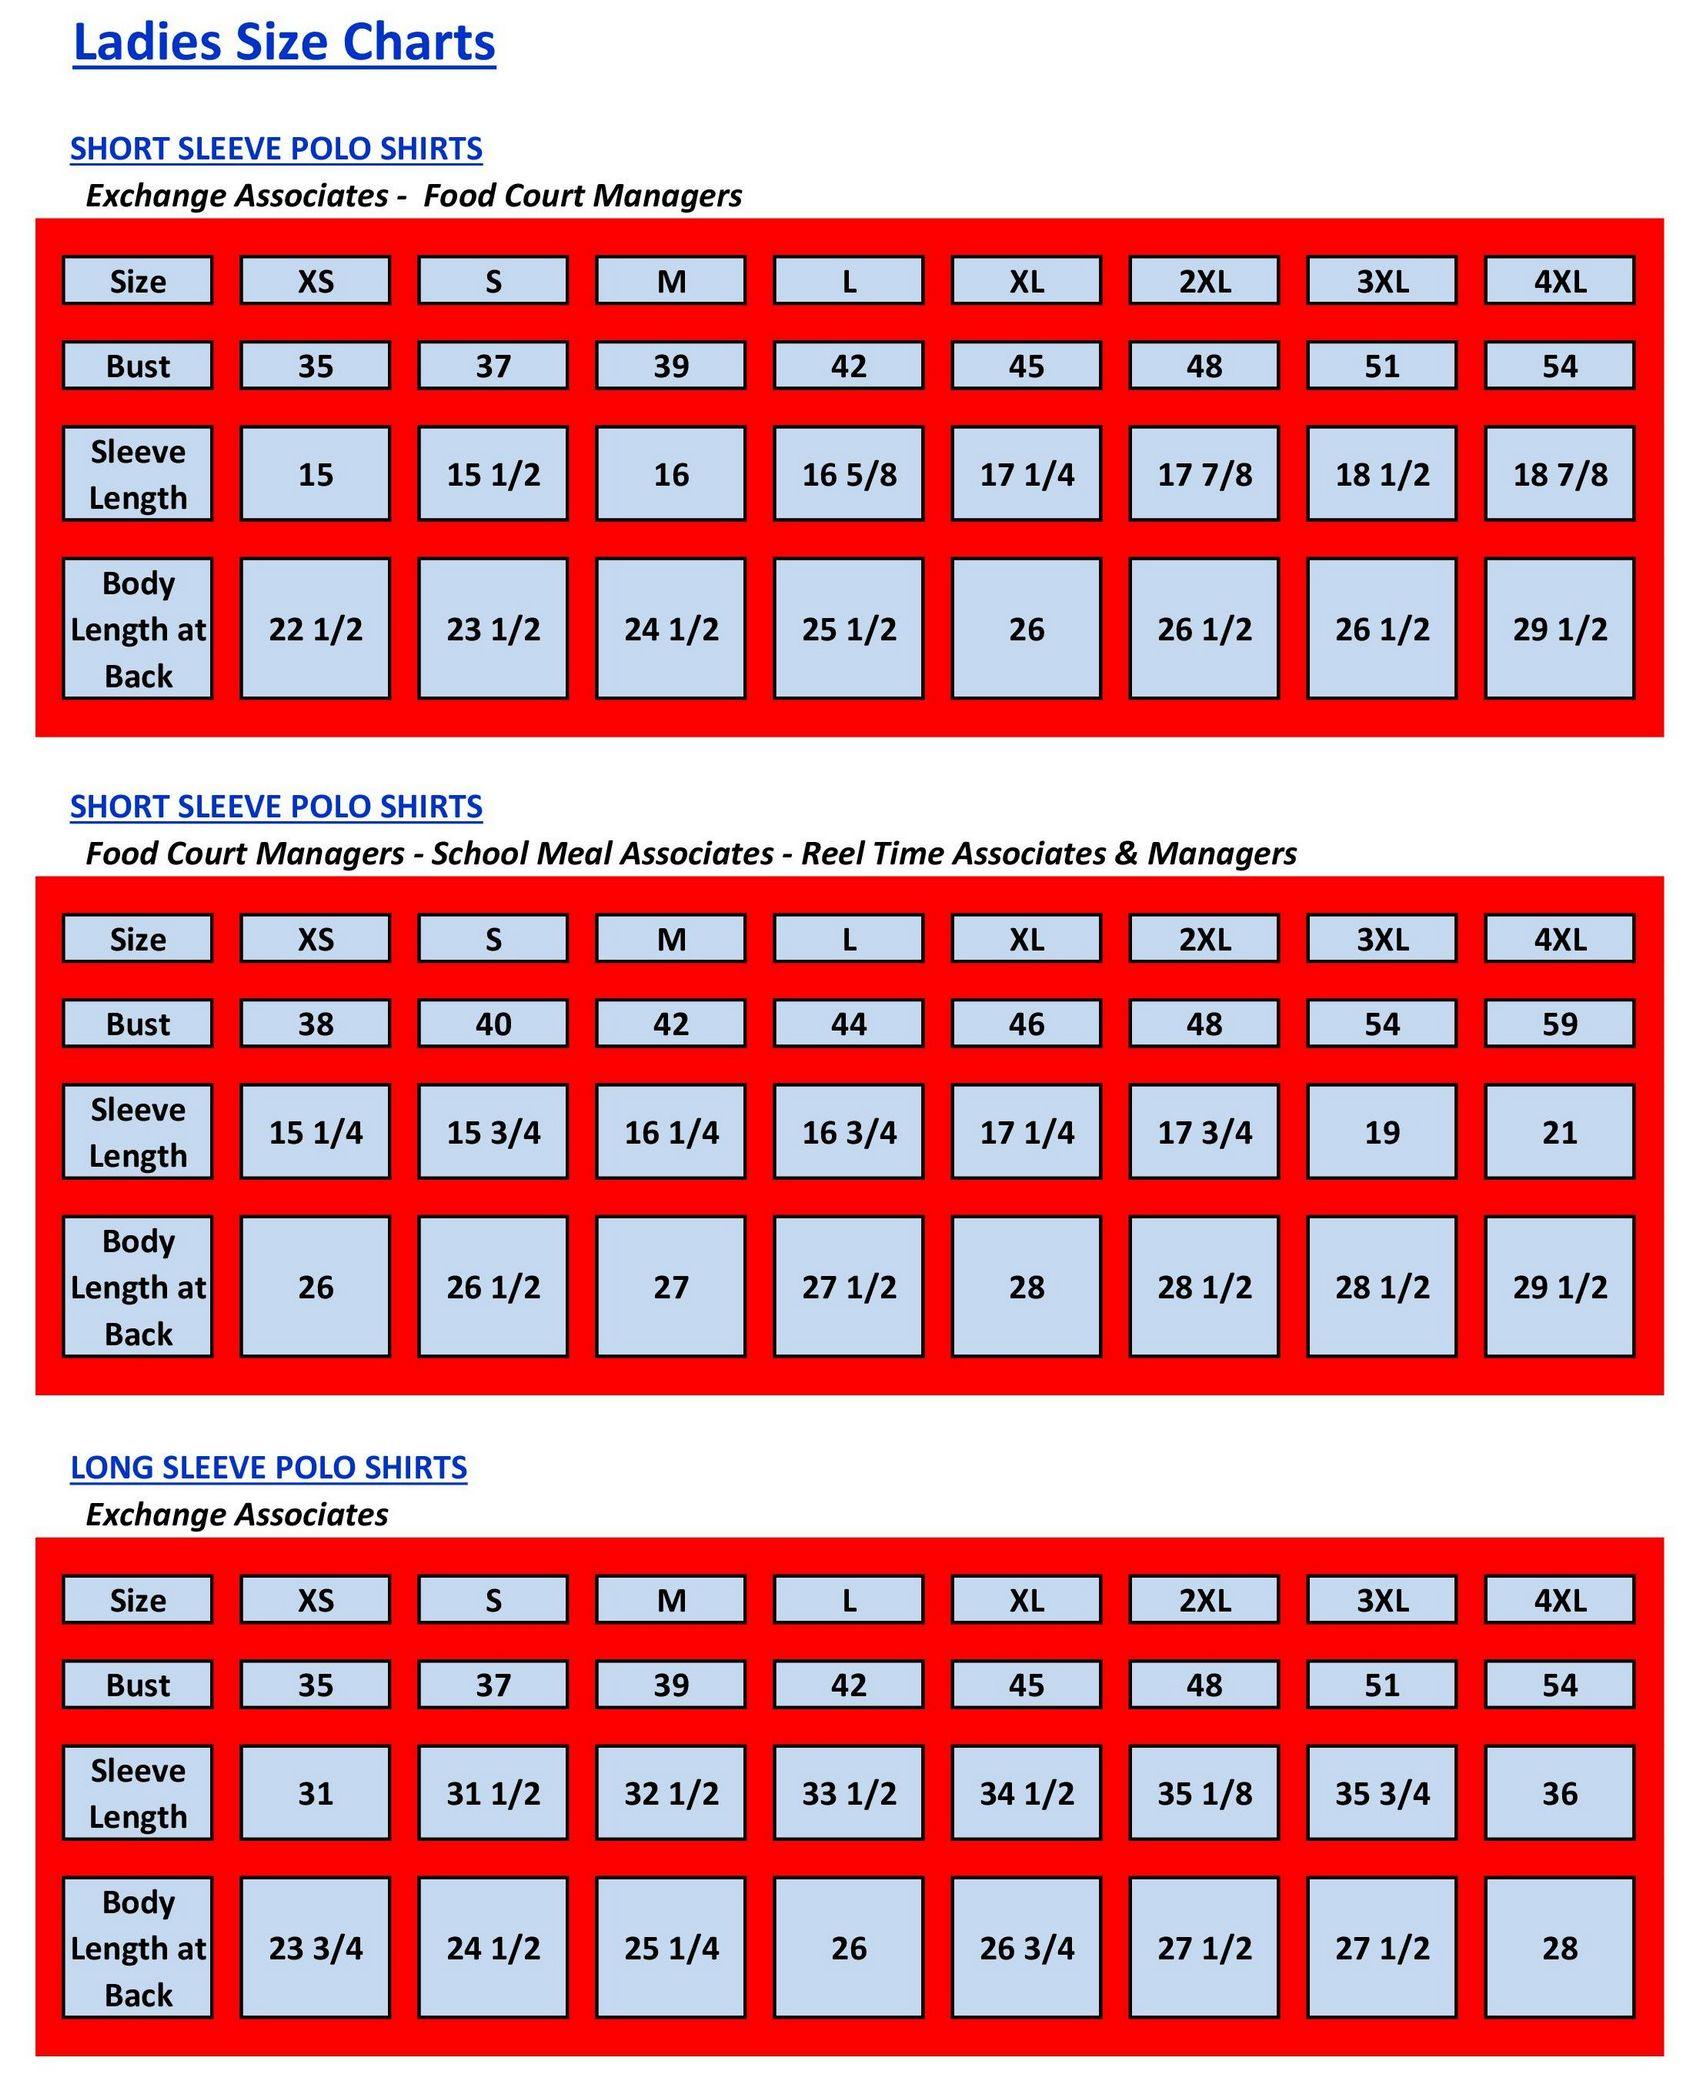 aa-size-chart-ladies-pg-1-140908-final.jpg